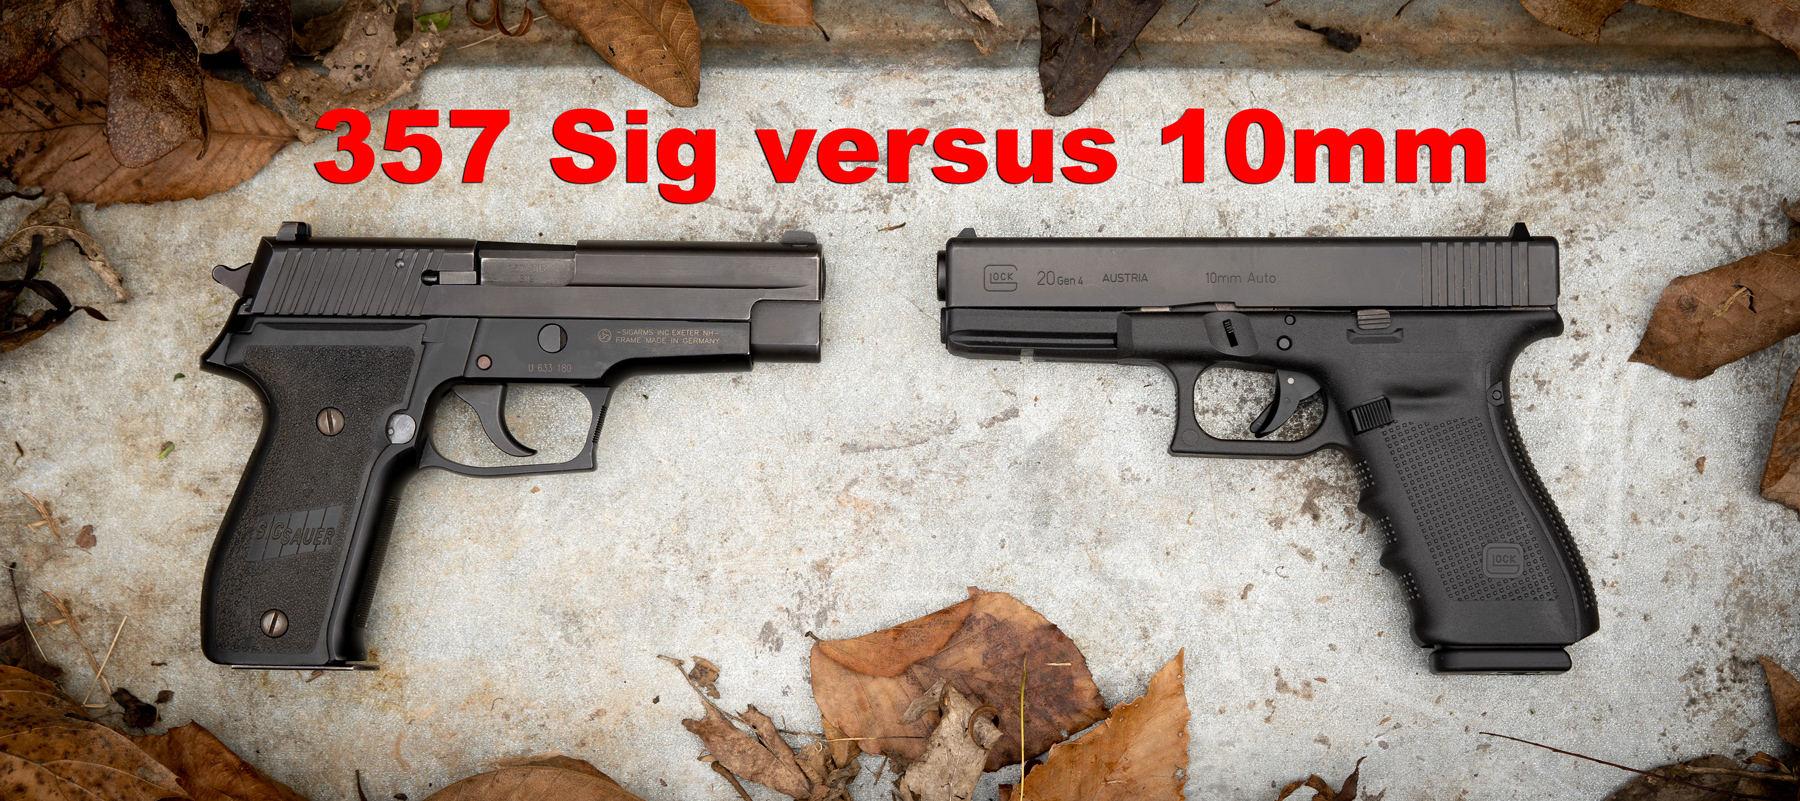 10mm vs. 357 Sig - The Lodge at AmmoToGo.com